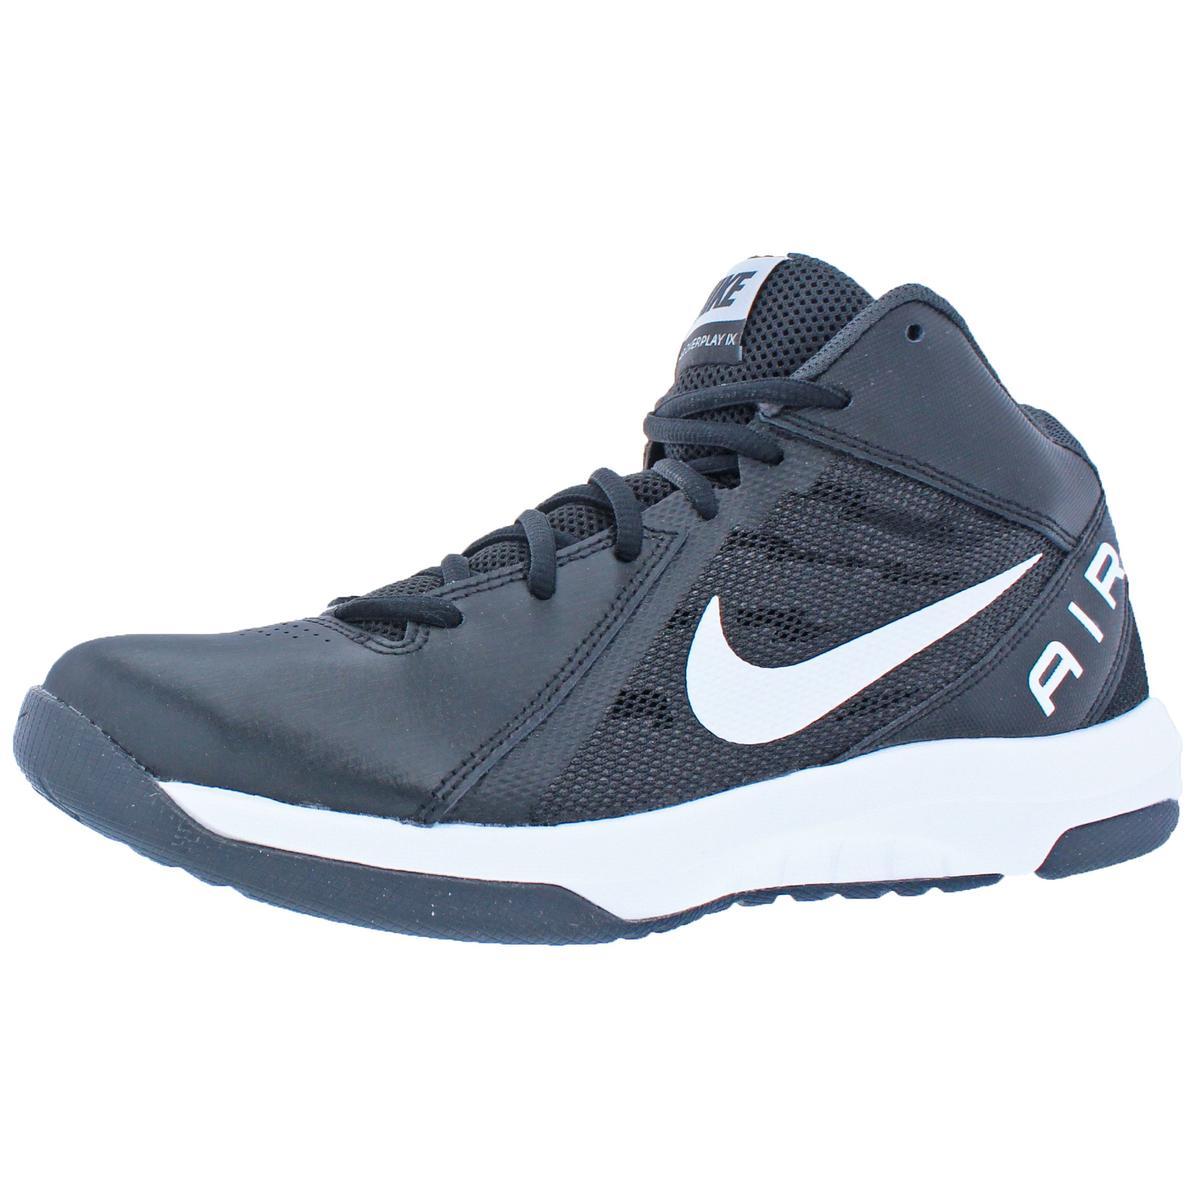 292e60e8a4e4 Details about Nike Mens Air Overplay 9 Black Basketball Shoes Sneakers 7.5  Wide (E) BHFO 9142